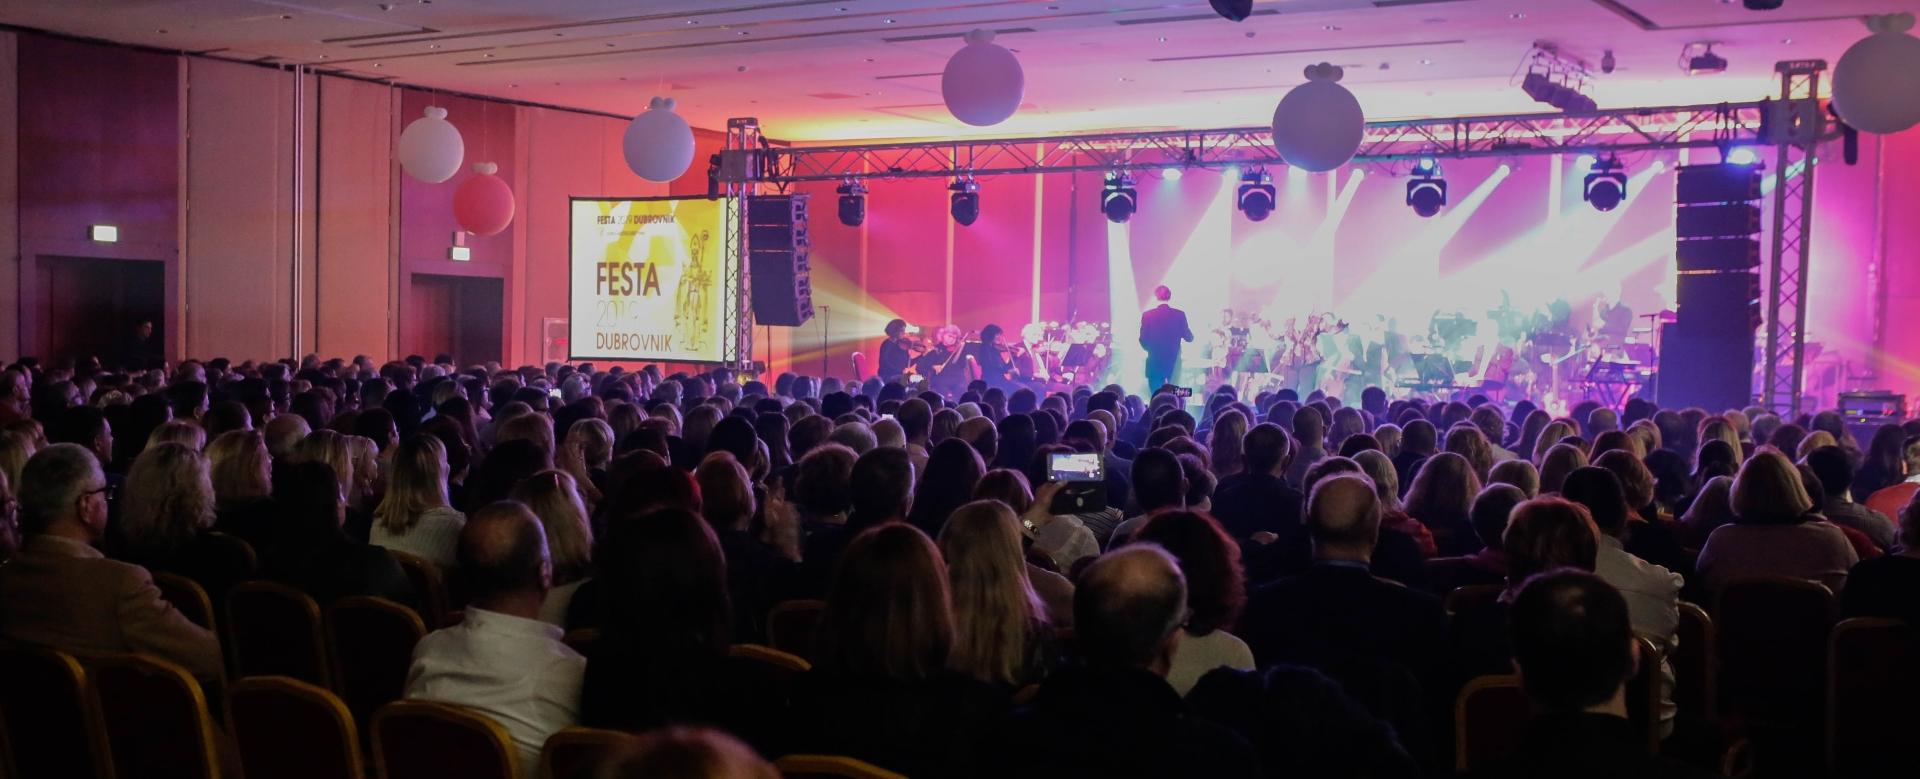 FOTO: Humanitarnim galakoncertom završio program FESTE 2019 DUBROVNIK